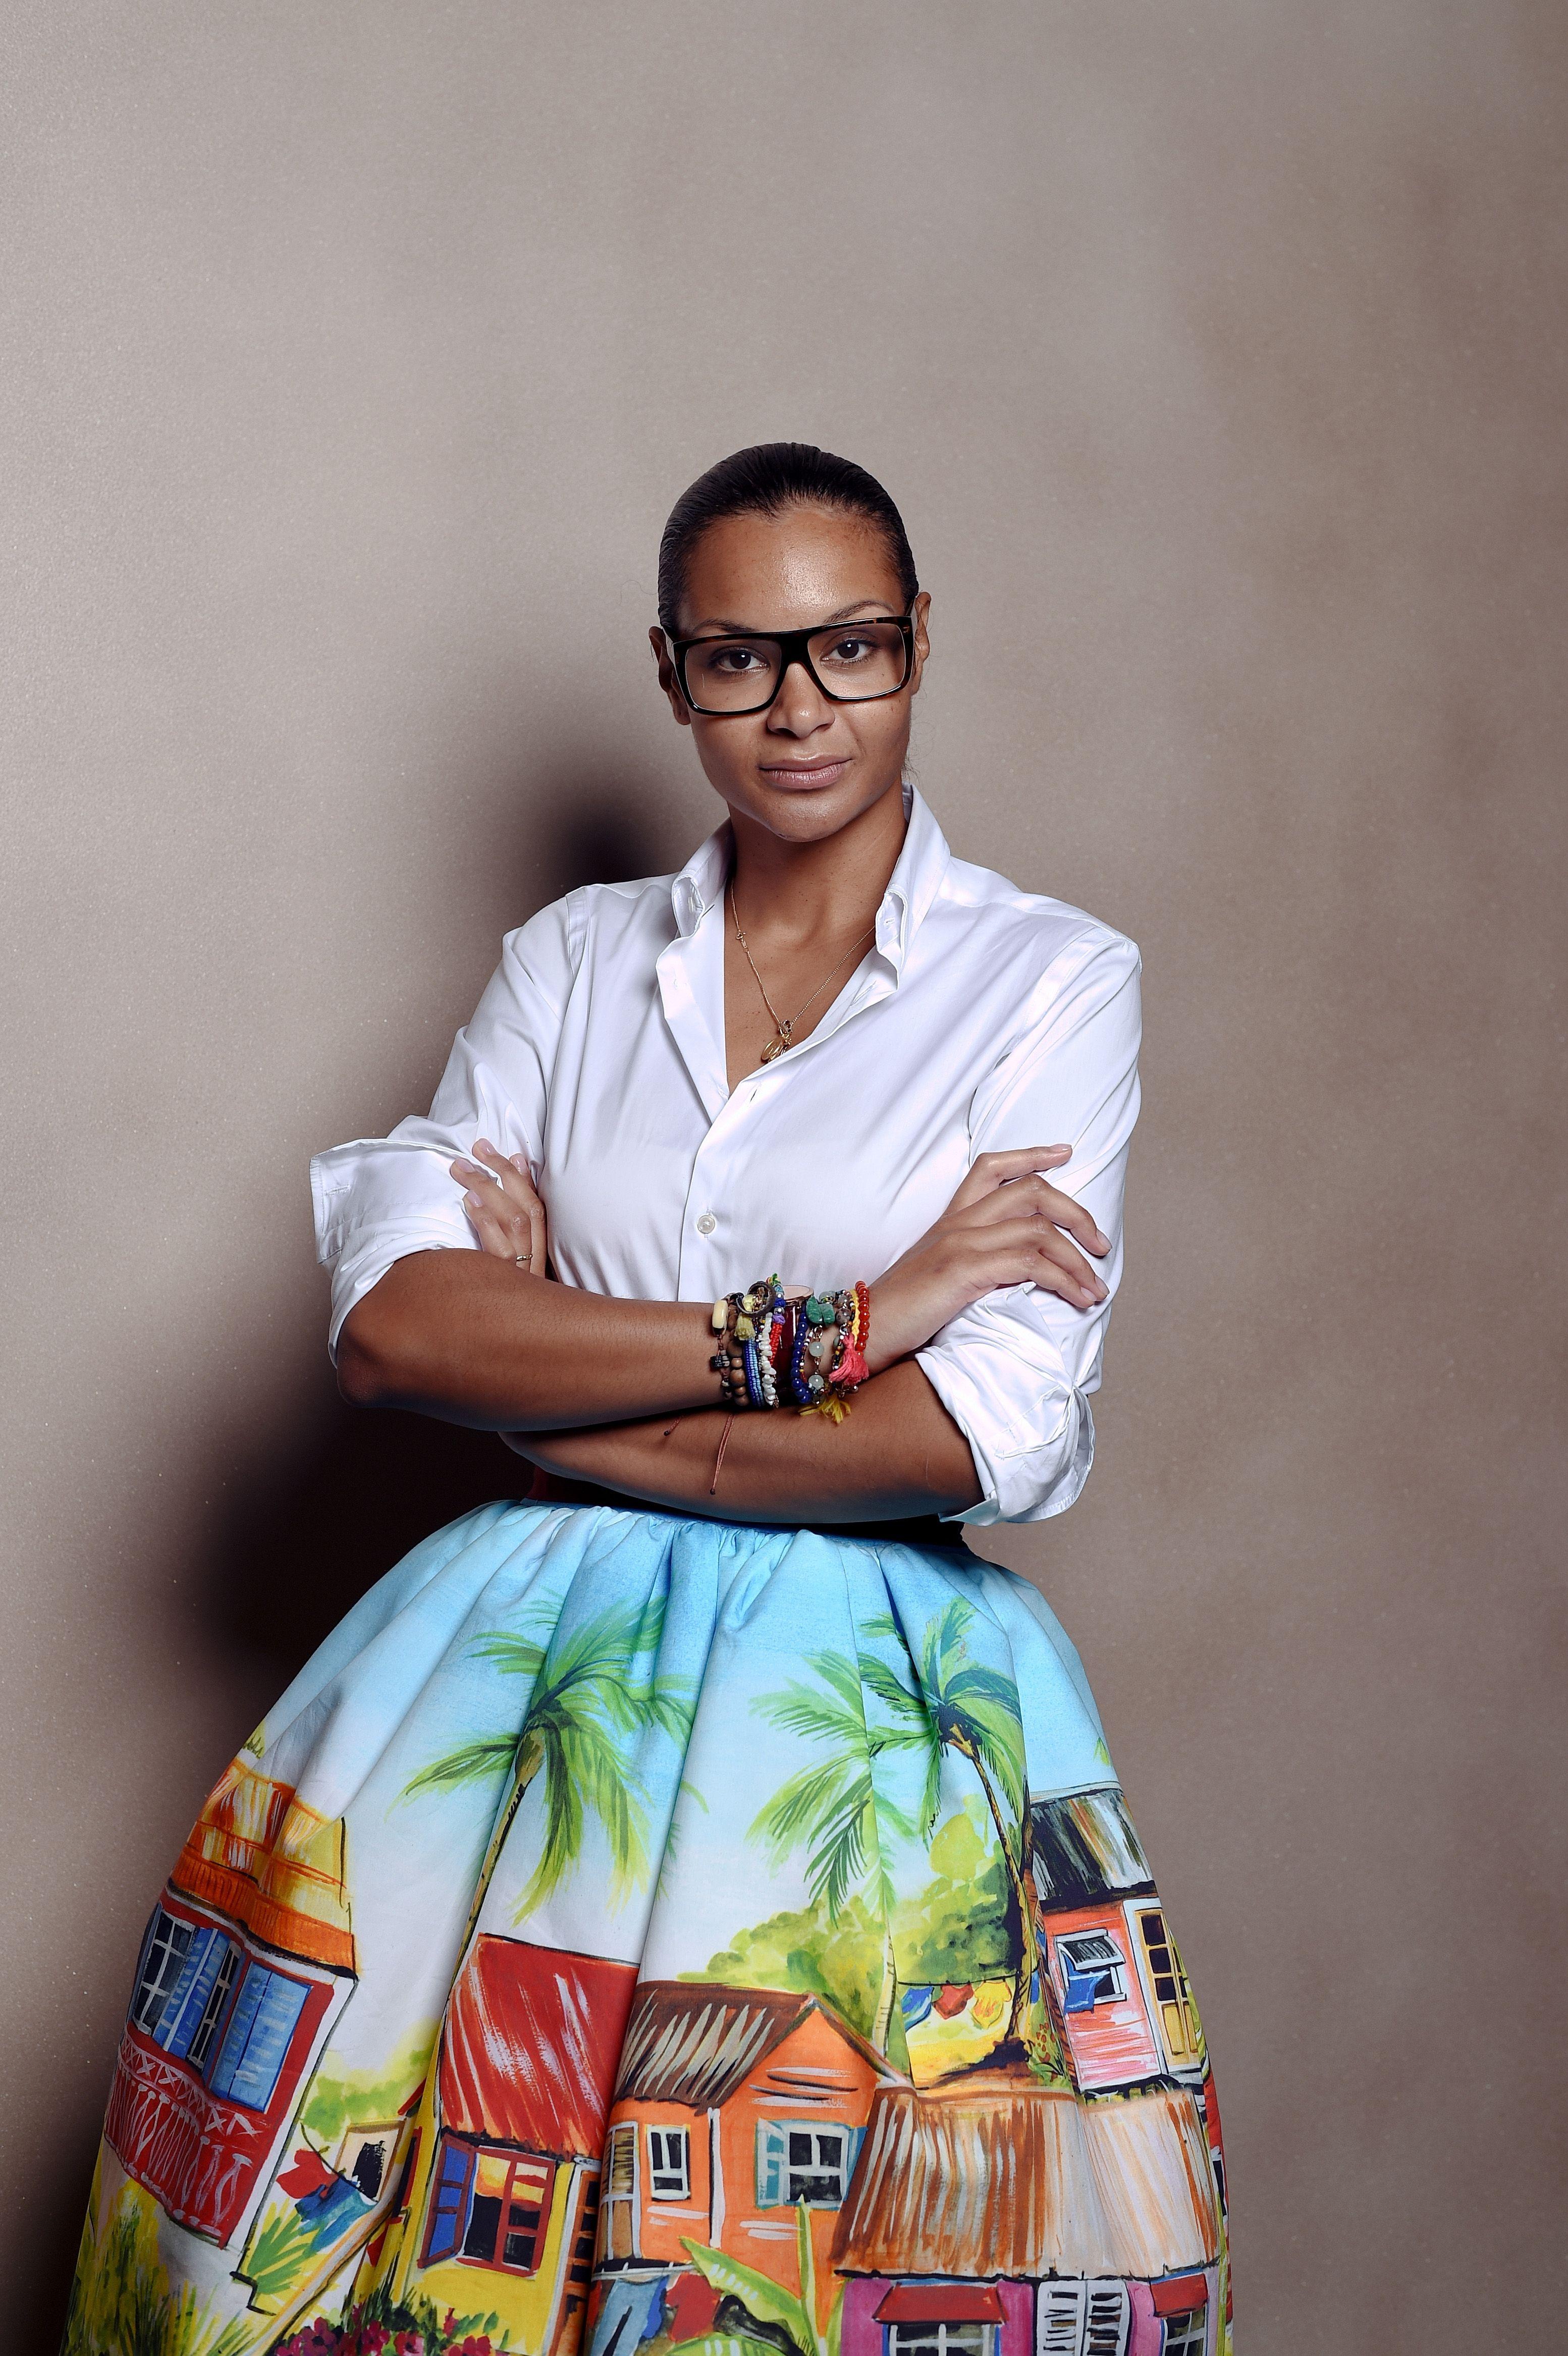 20 Black Fashion Designers Who Shaped History